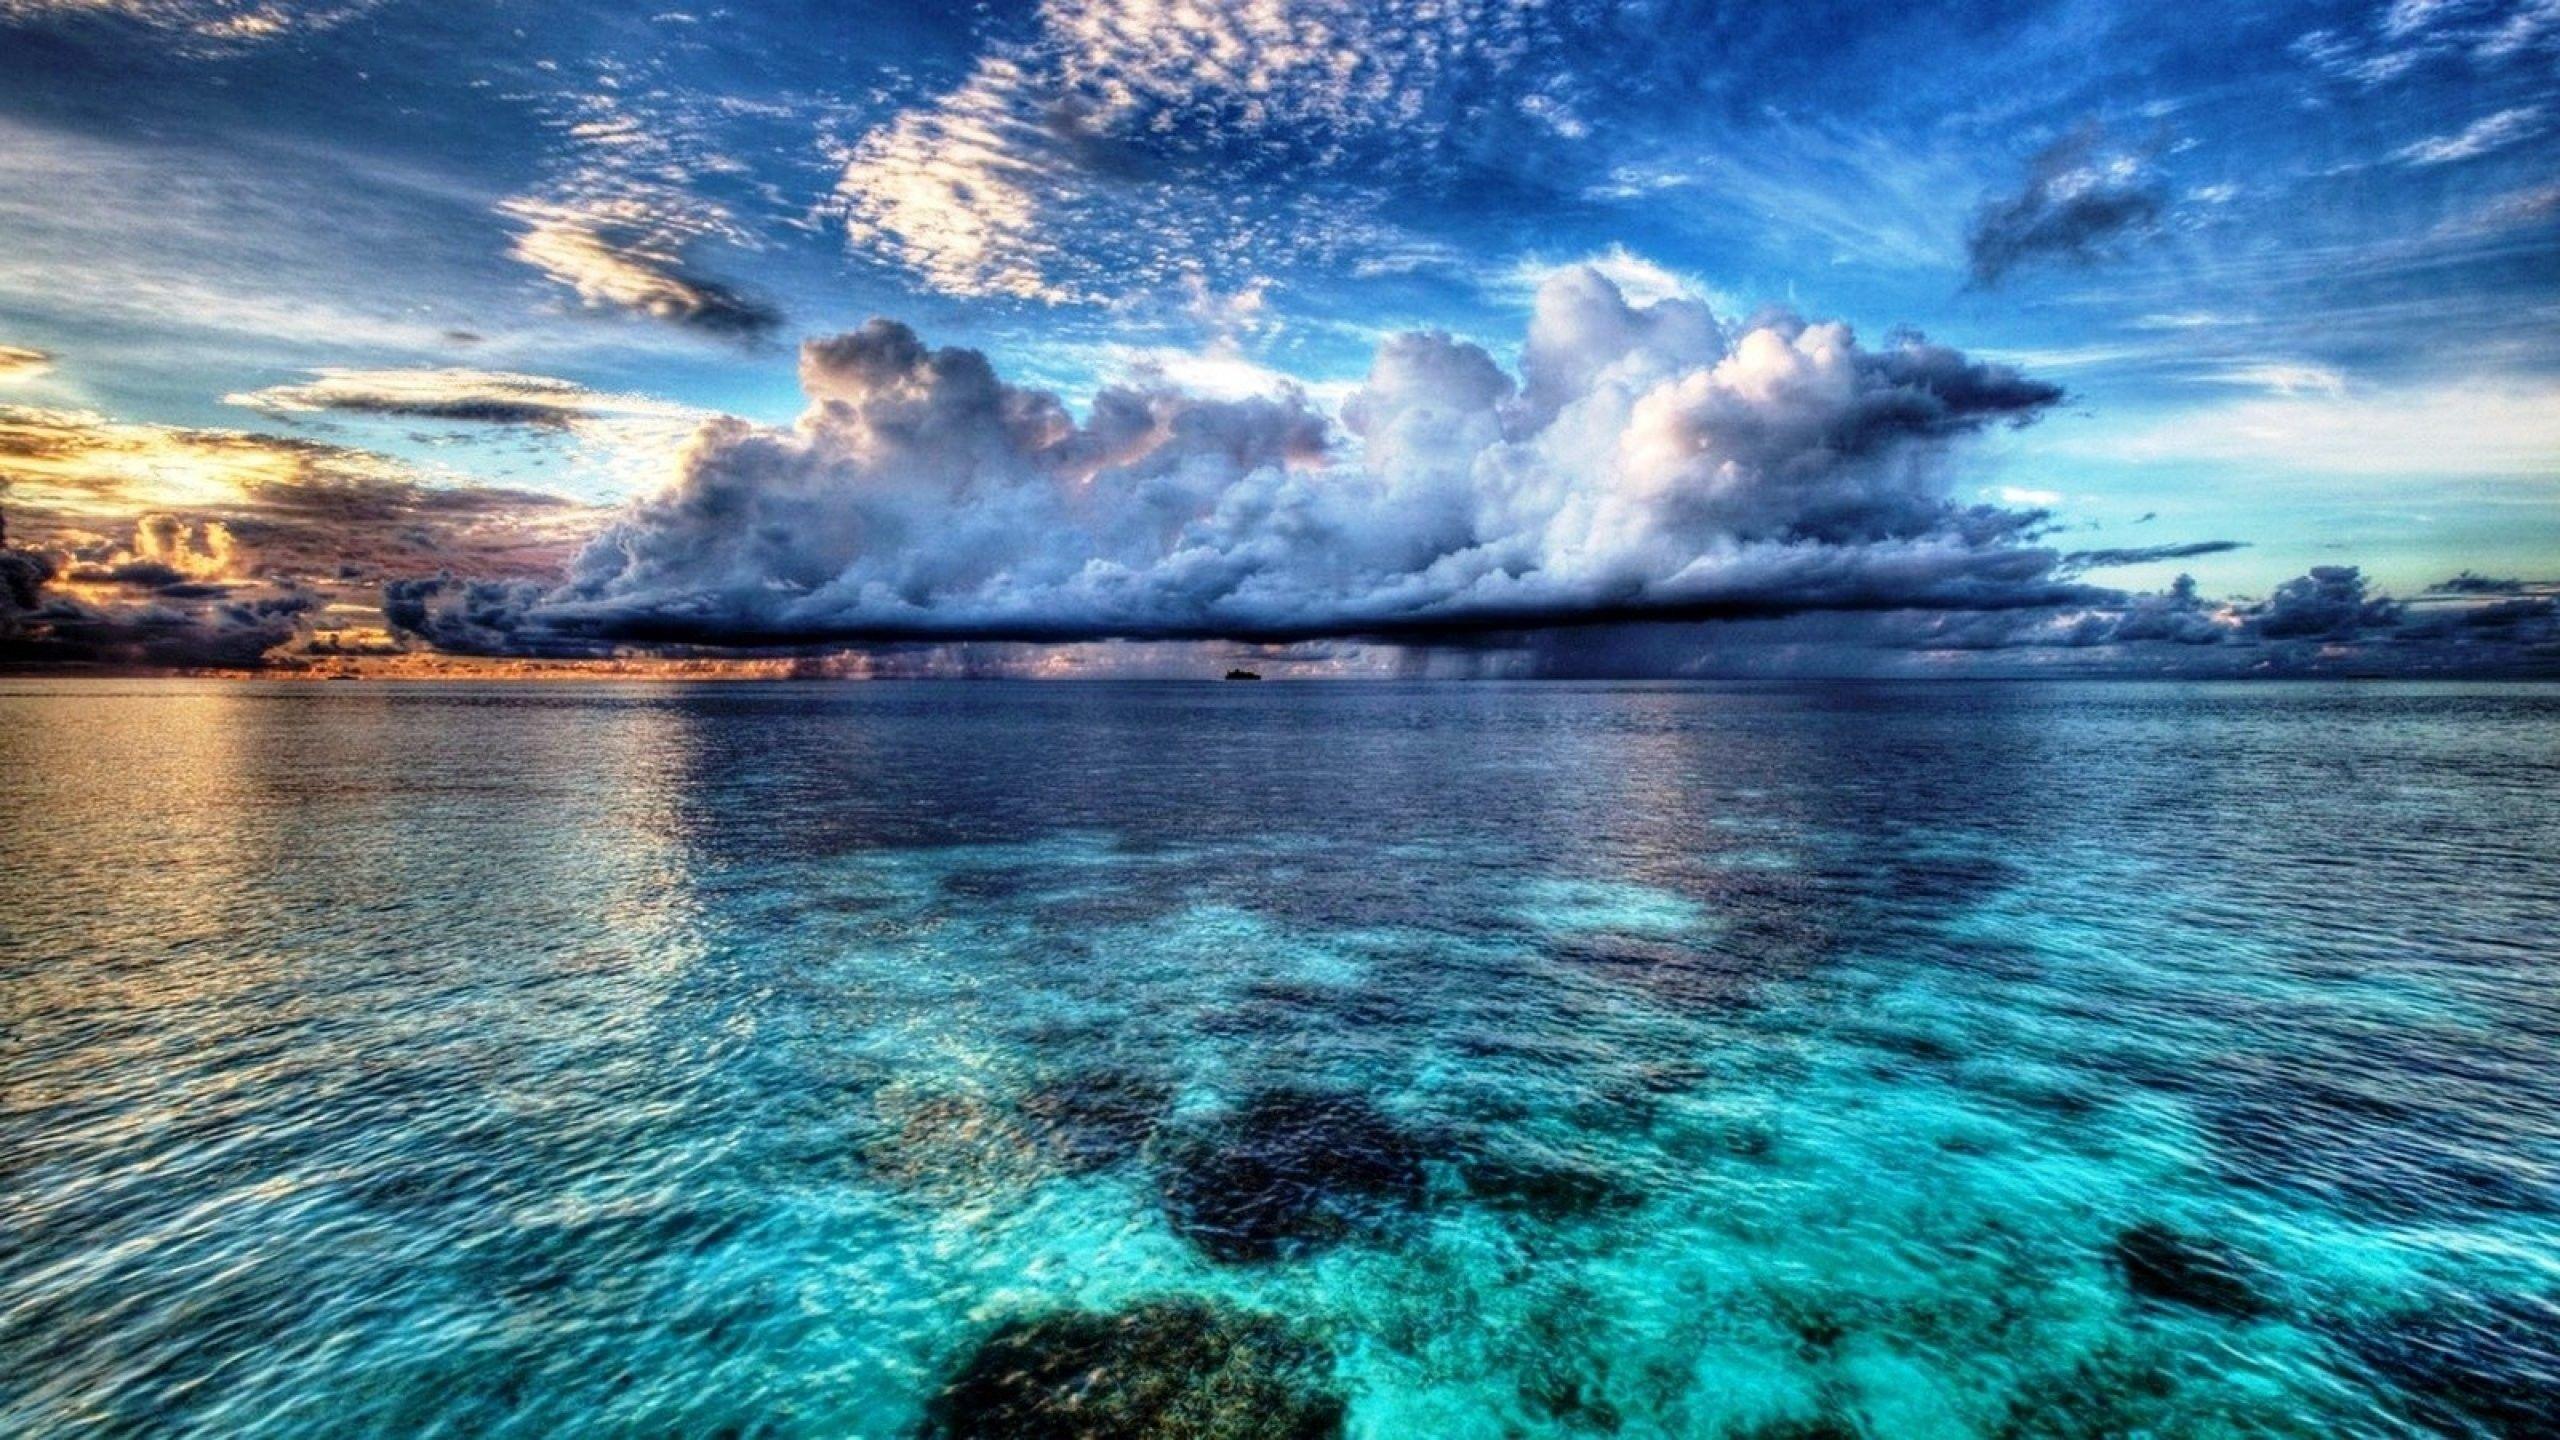 65 Ocean HD Desktop Wallpapers   Download at WallpaperBro 2560x1440